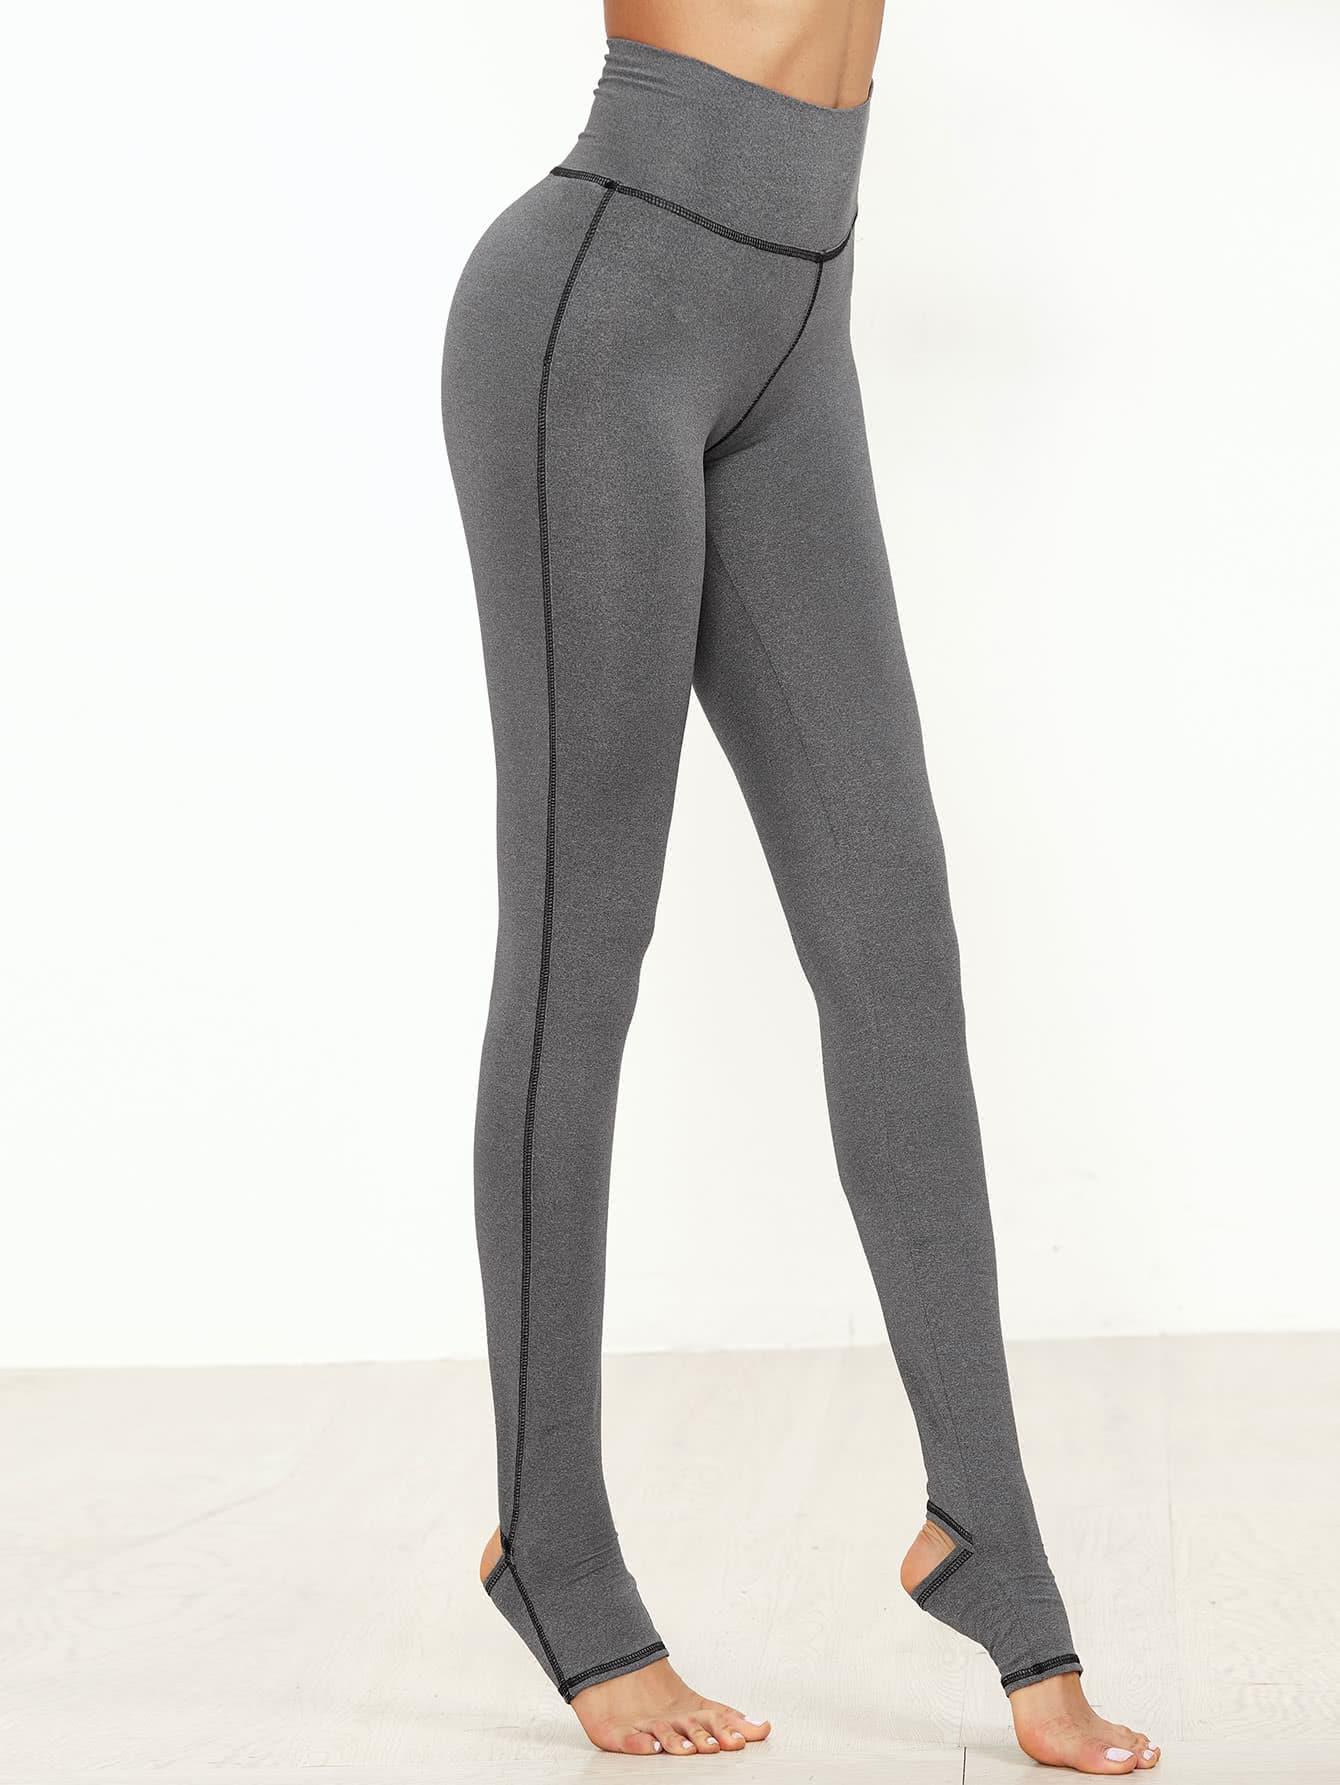 Marled Knit Topstitch Stirrup Leggings marled knit topstitch stirrup leggings